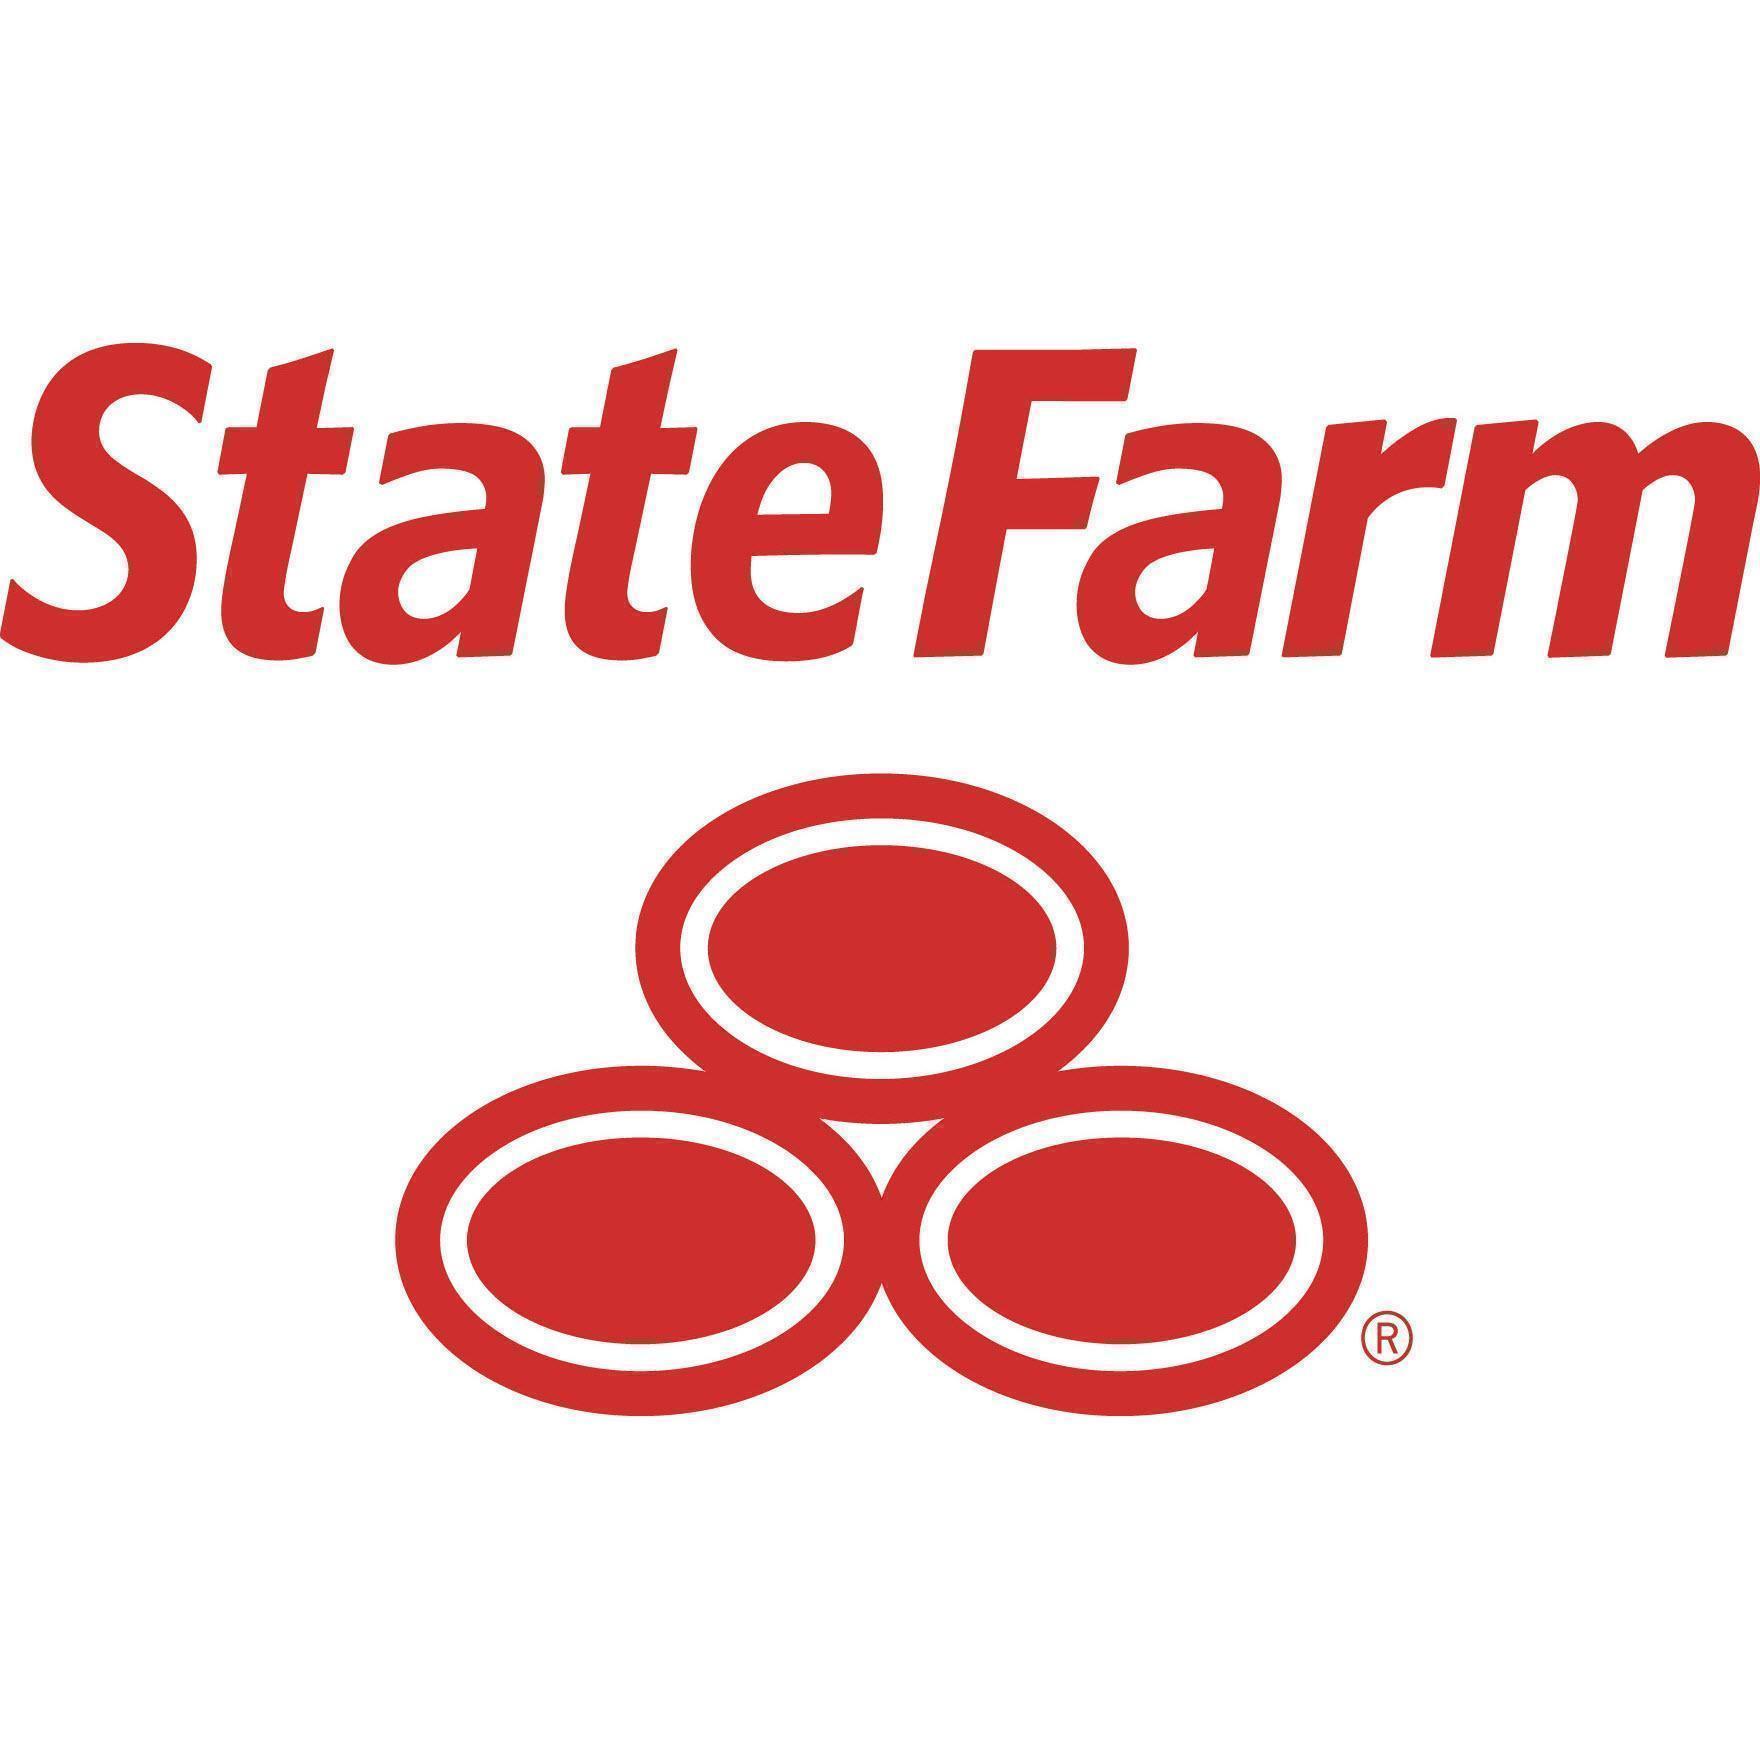 Stephanie Featherstone - State Farm Insurance Agent